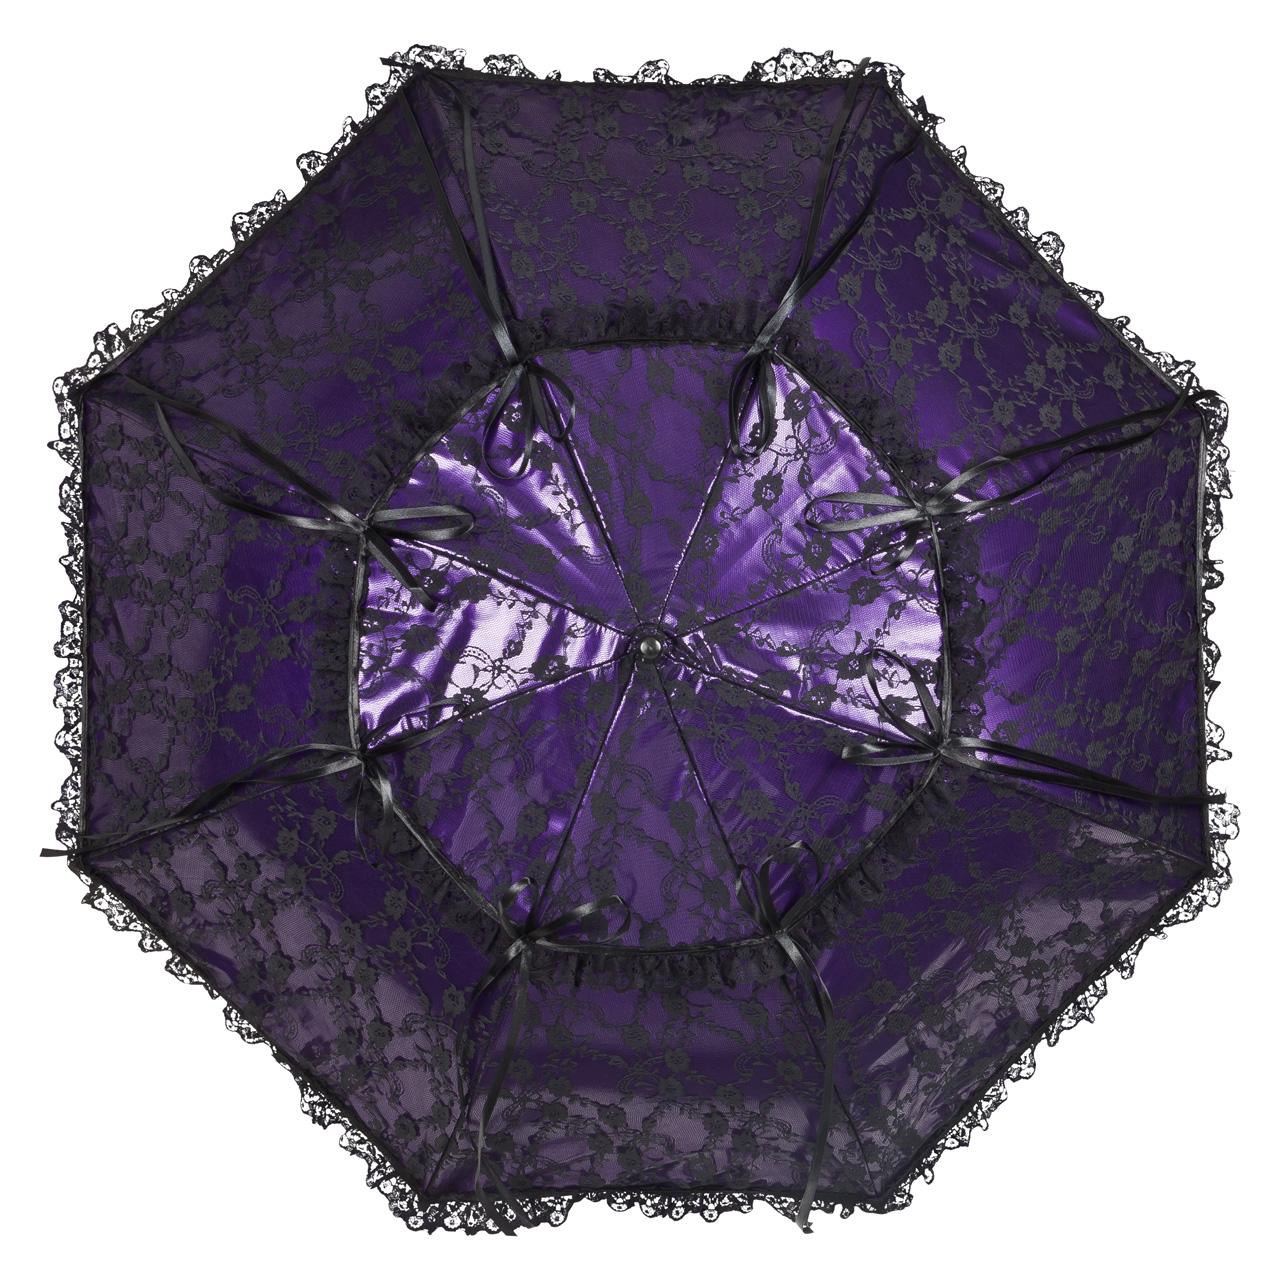 regenschirm sonnenschirm luna violett mit regenschutz. Black Bedroom Furniture Sets. Home Design Ideas